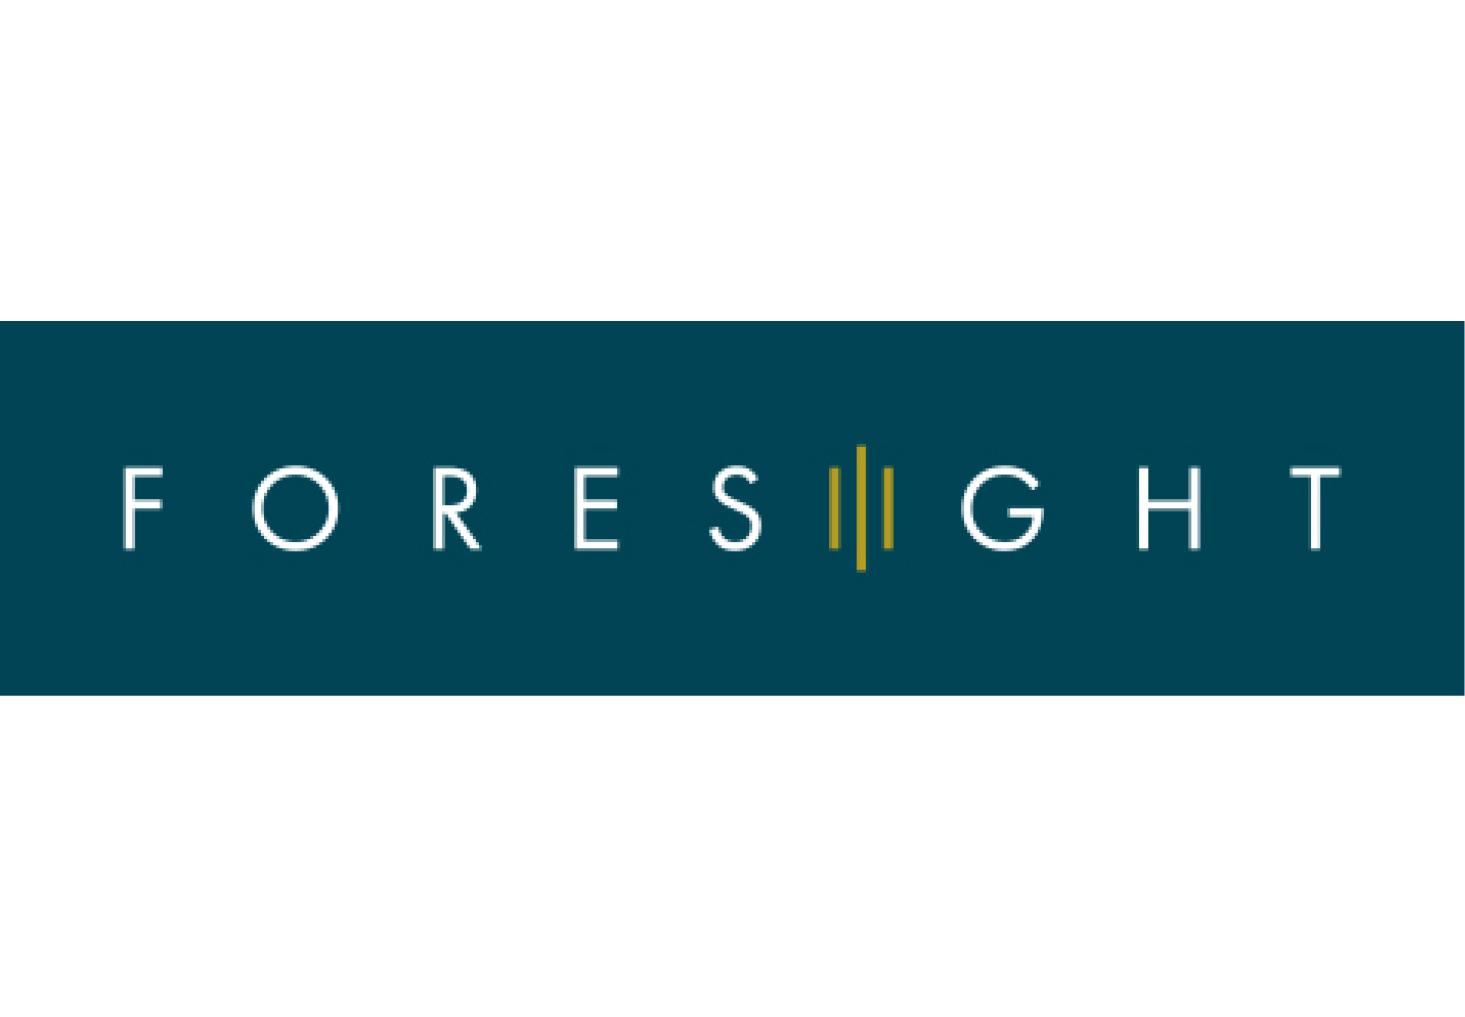 Foresight logo Yorkshire Legal Awards 2019